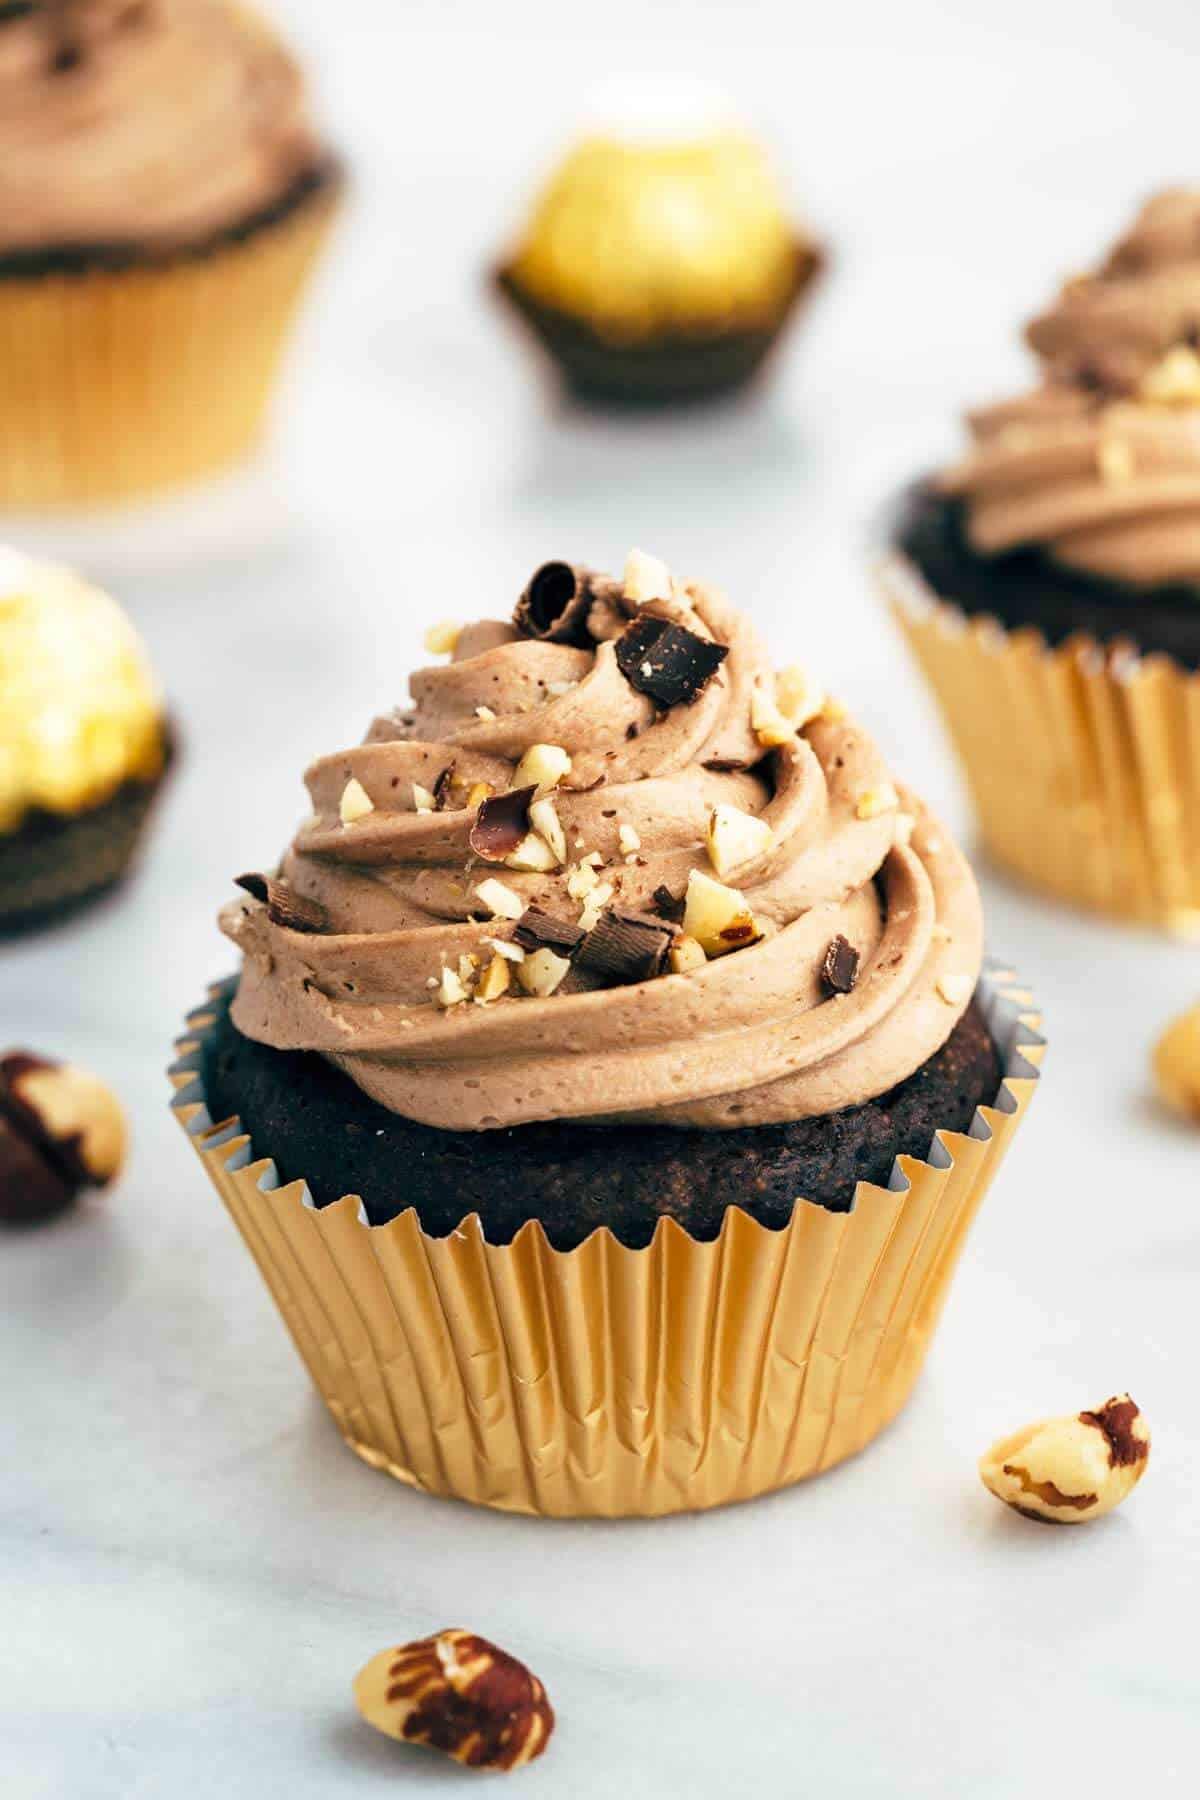 Ferrero Rocher inspired cupcakes with chocolate ganache filling and Nutella hazelnut buttercream | jessicagavin.com